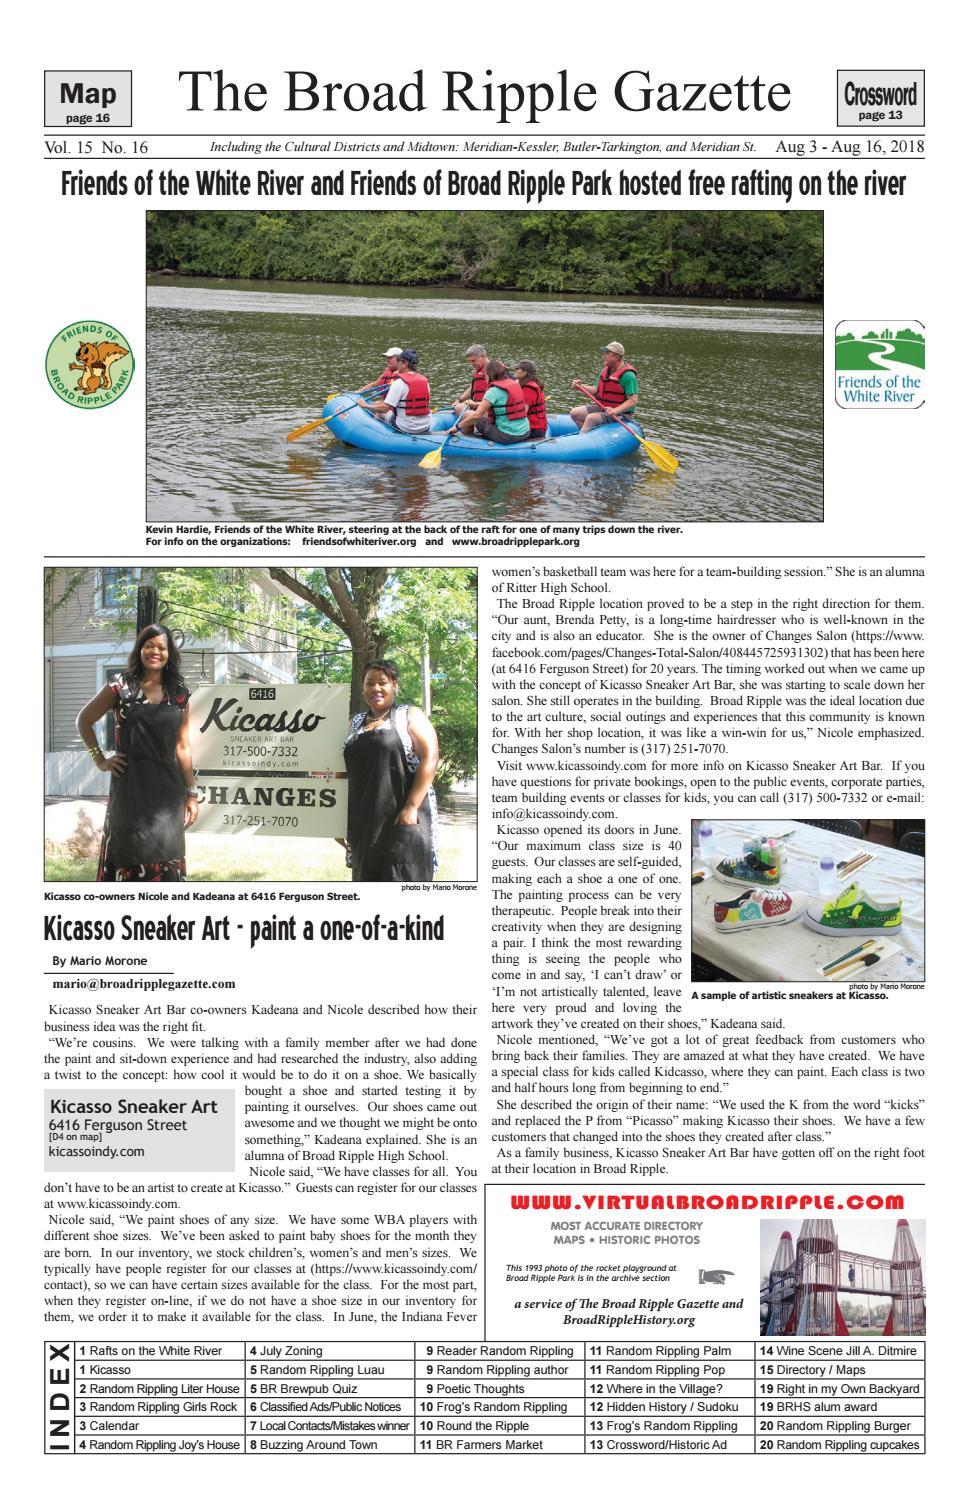 Broad Ripple Gazette Volume 15 Number 16 August 3 August 16 2018